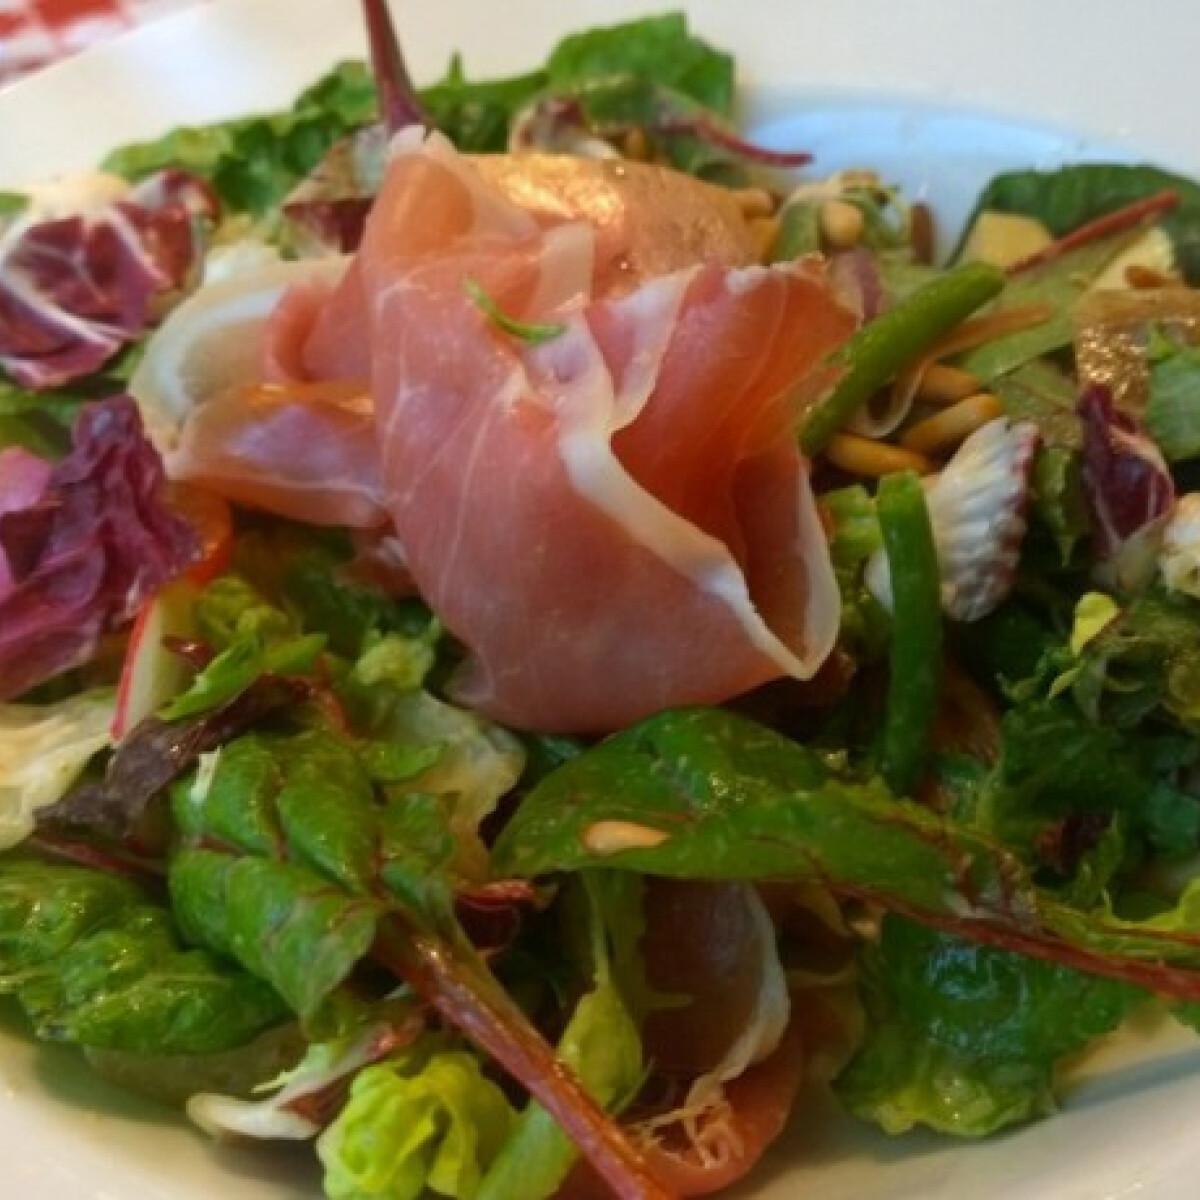 Tavaszi prosciutto saláta